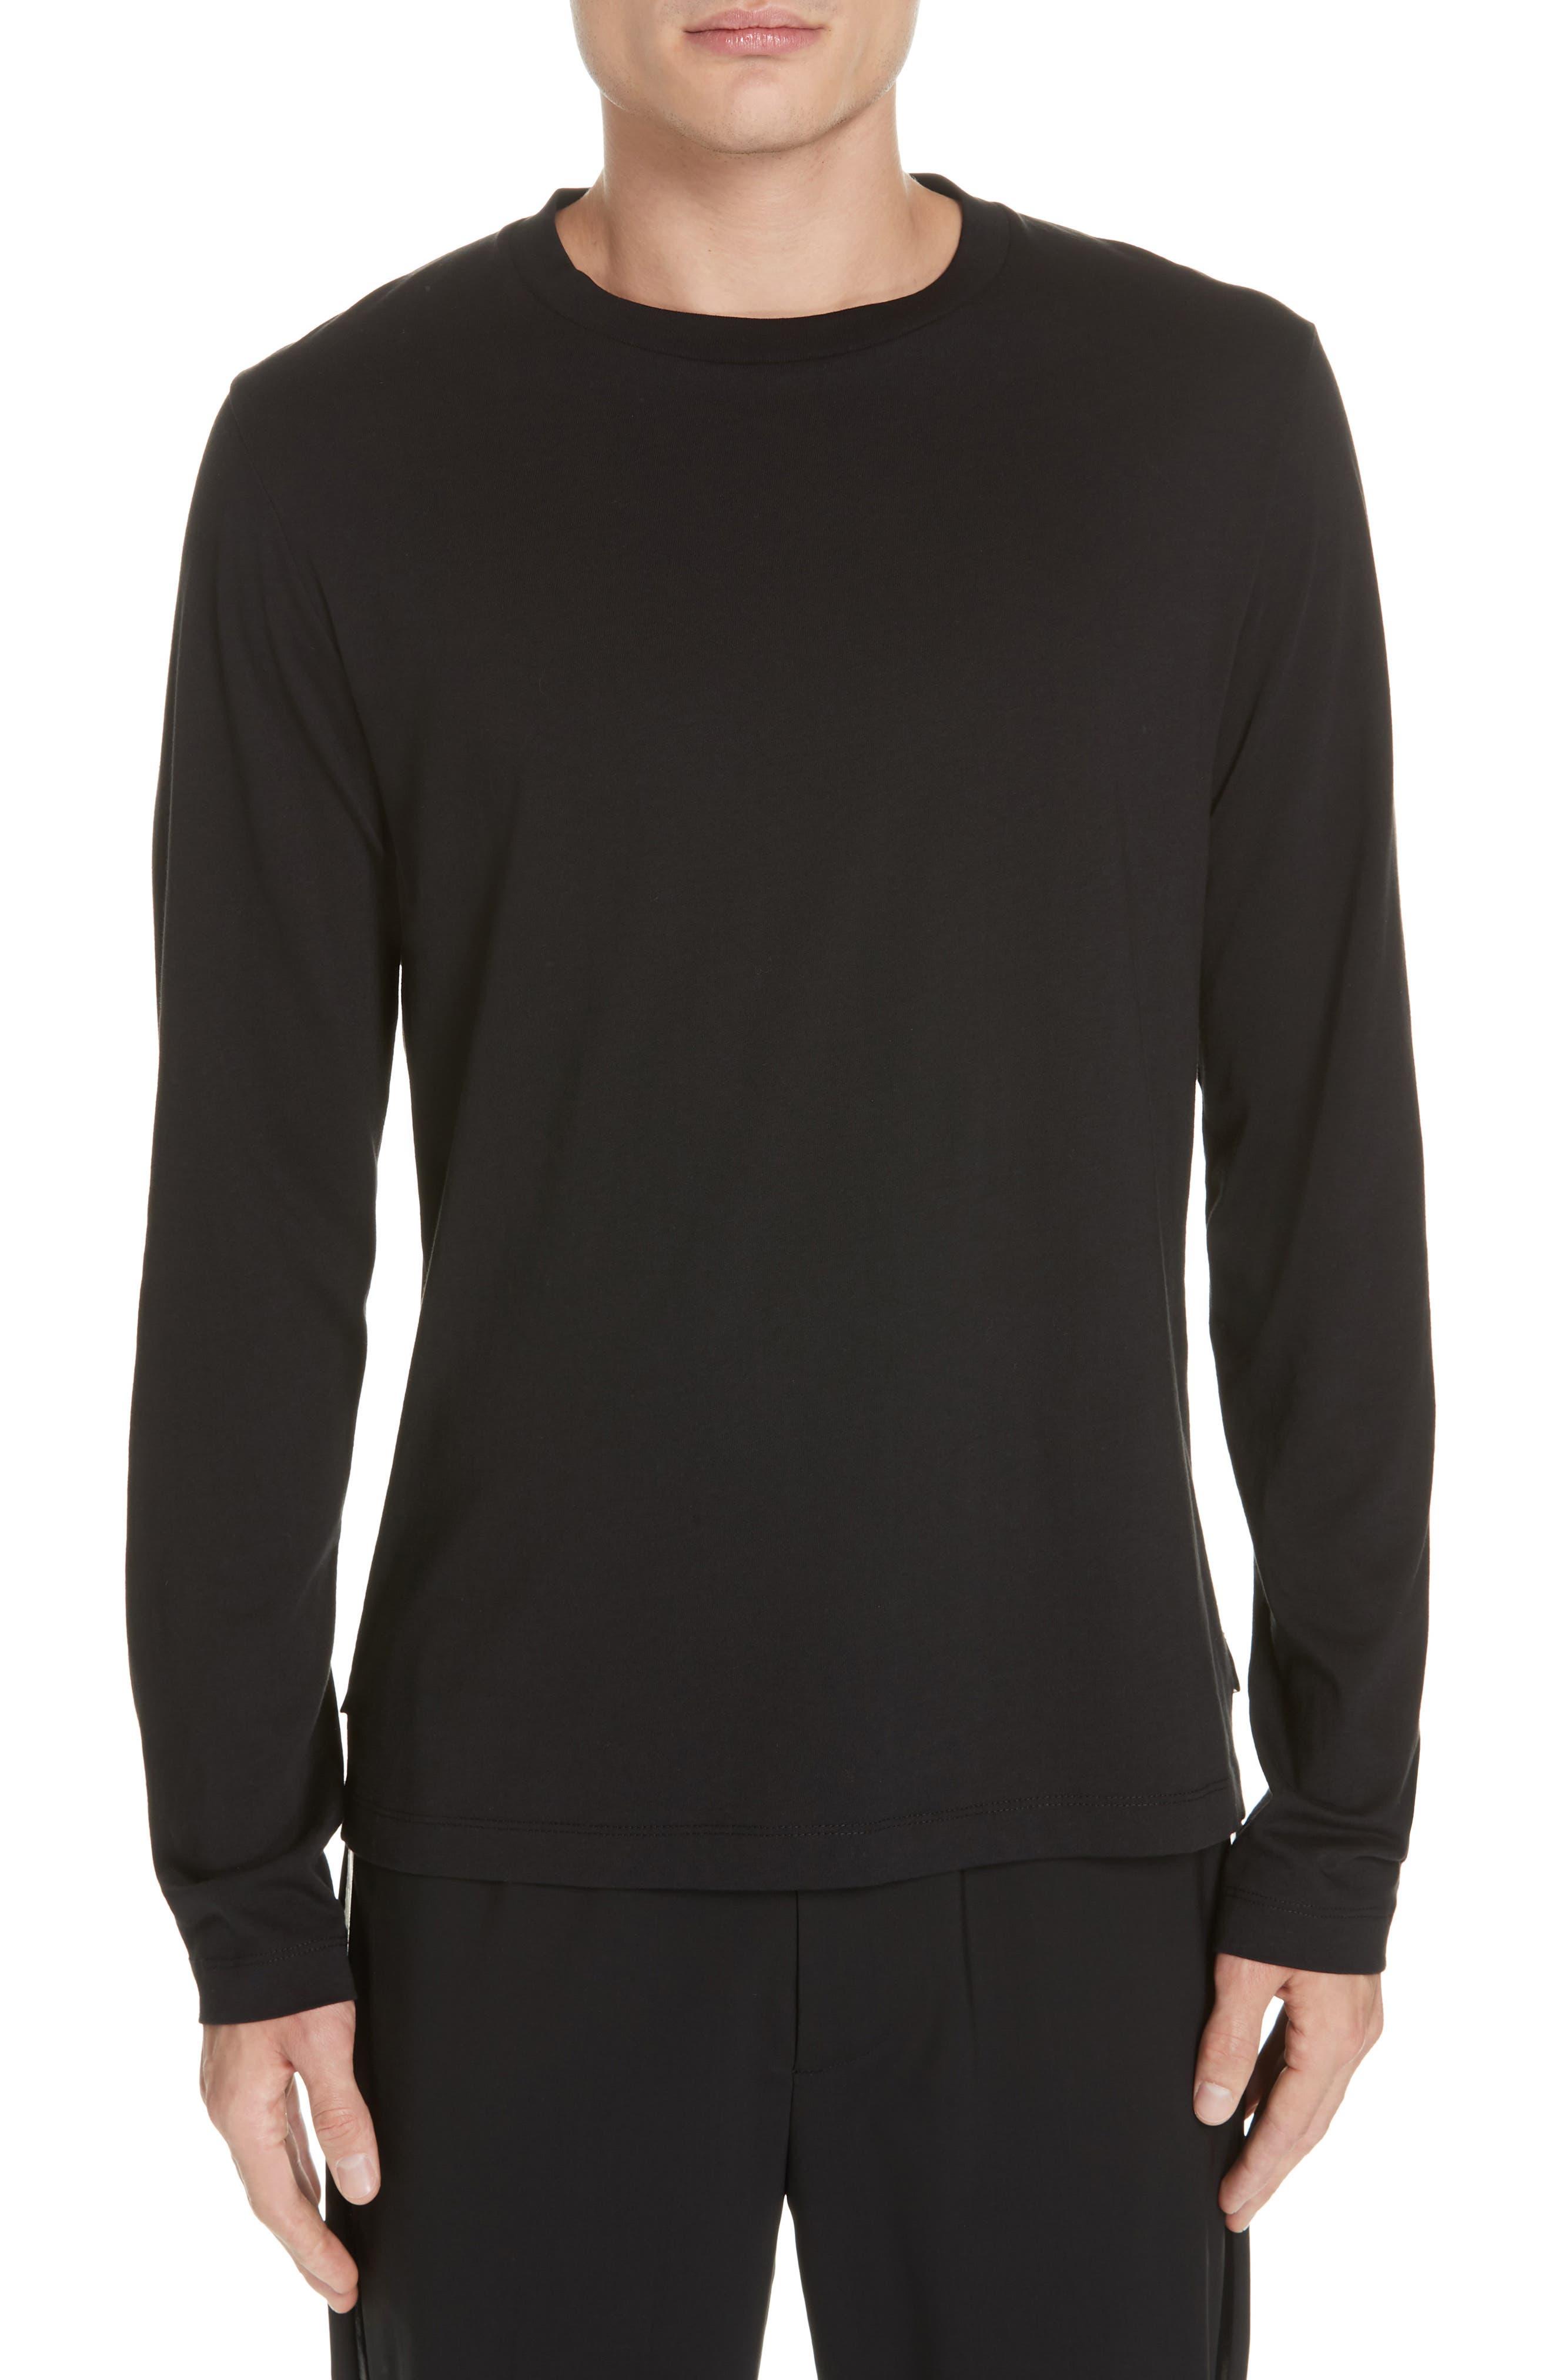 HELMUT LANG, Overlay Long Sleeve T-Shirt, Main thumbnail 1, color, BLACK